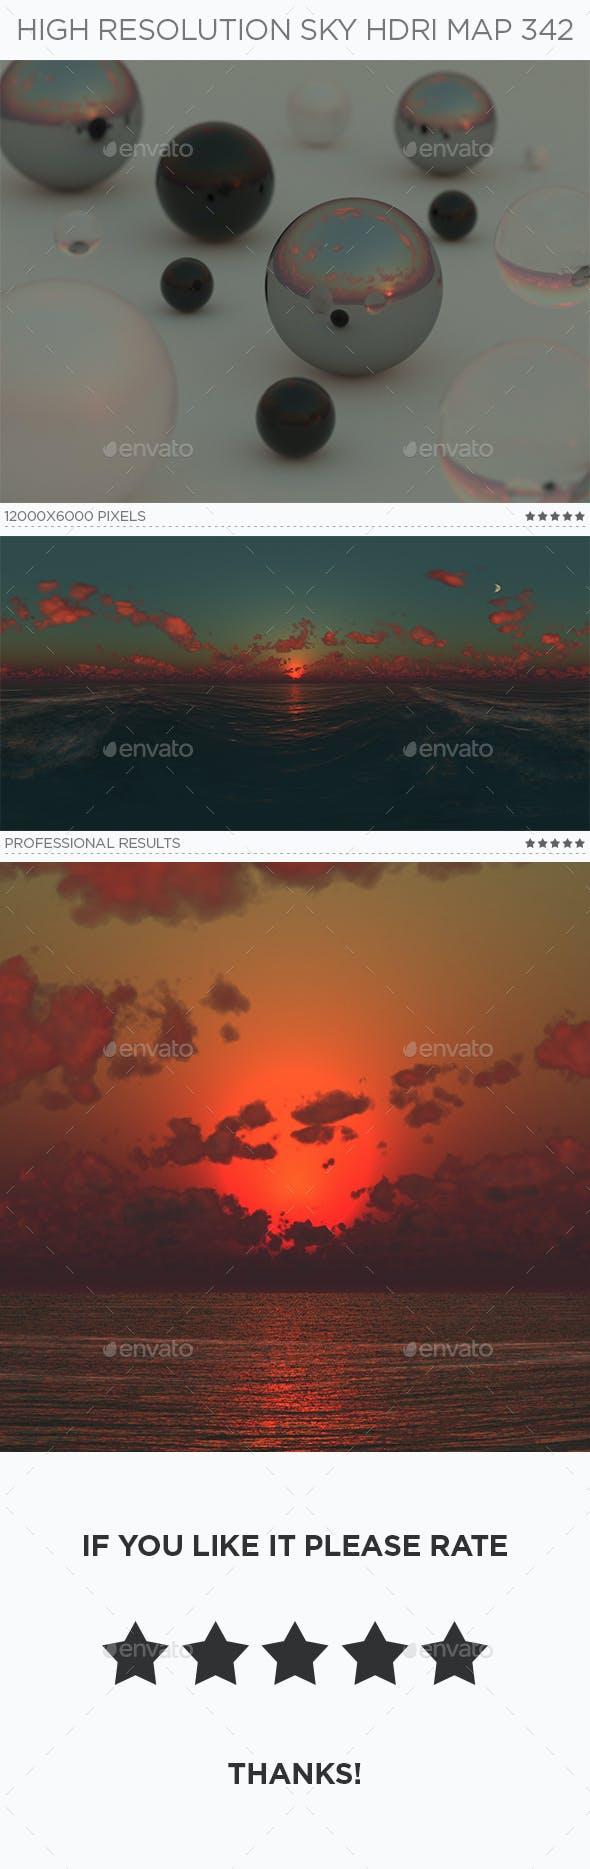 High Resolution Sky HDRi Map 342 - 3DOcean Item for Sale